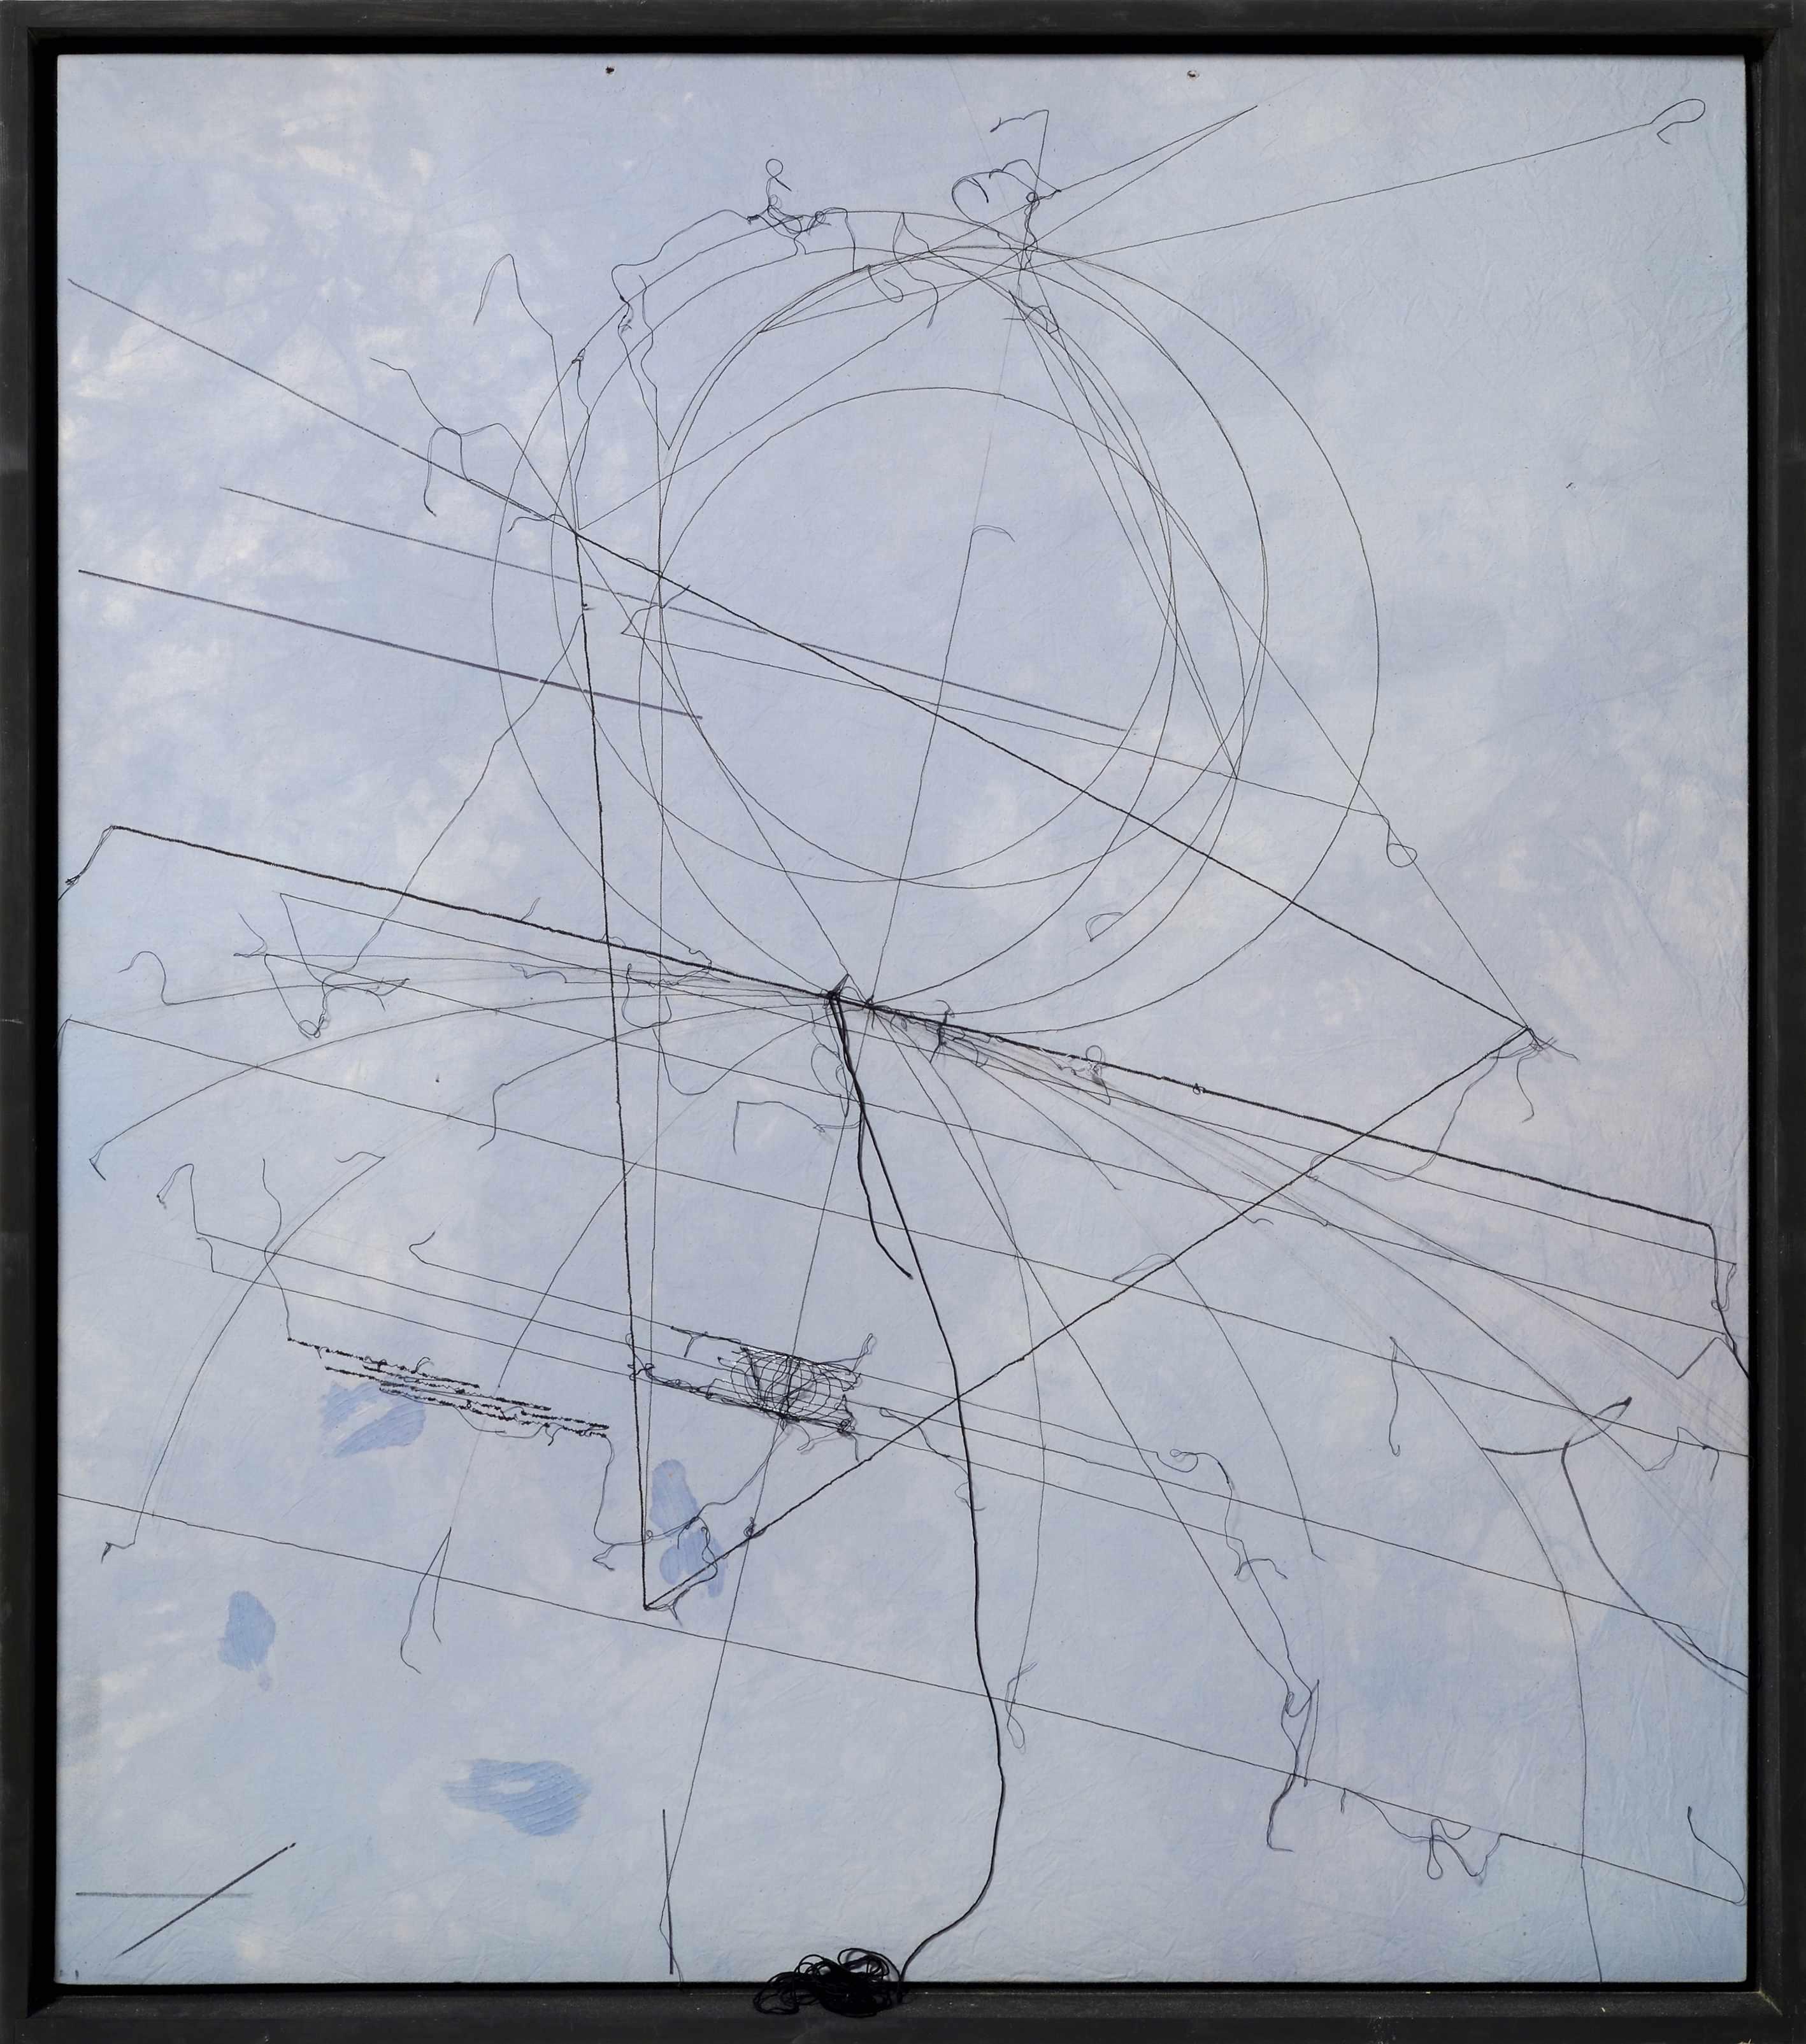 Maria Lai, Geografia, 1994, filo su tela, cm 126 x 111